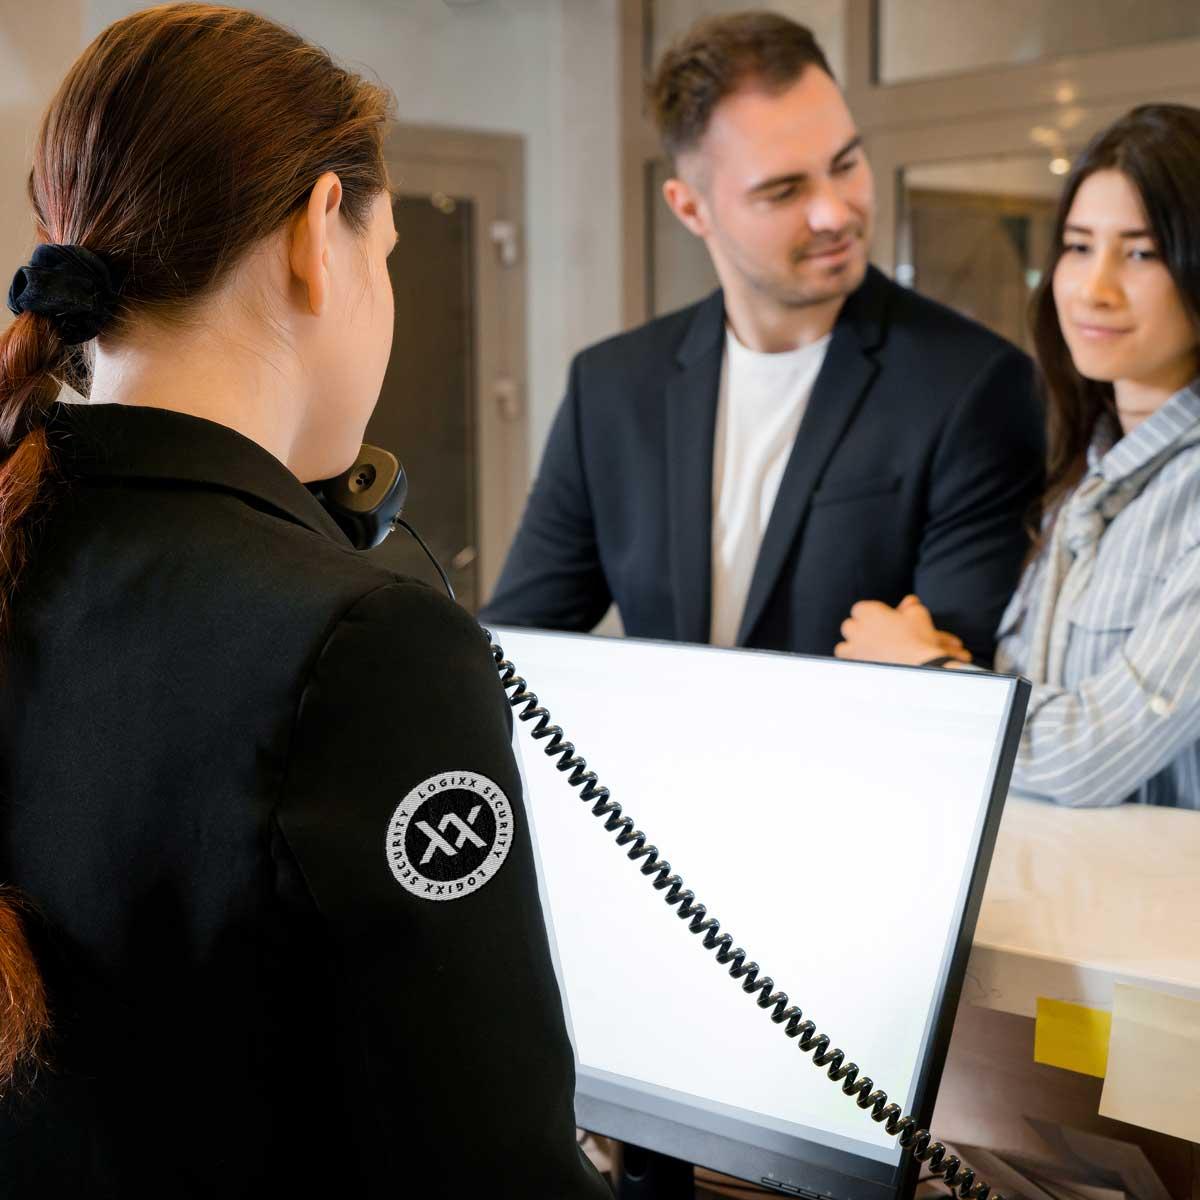 Security Guards Services, Logixx Security